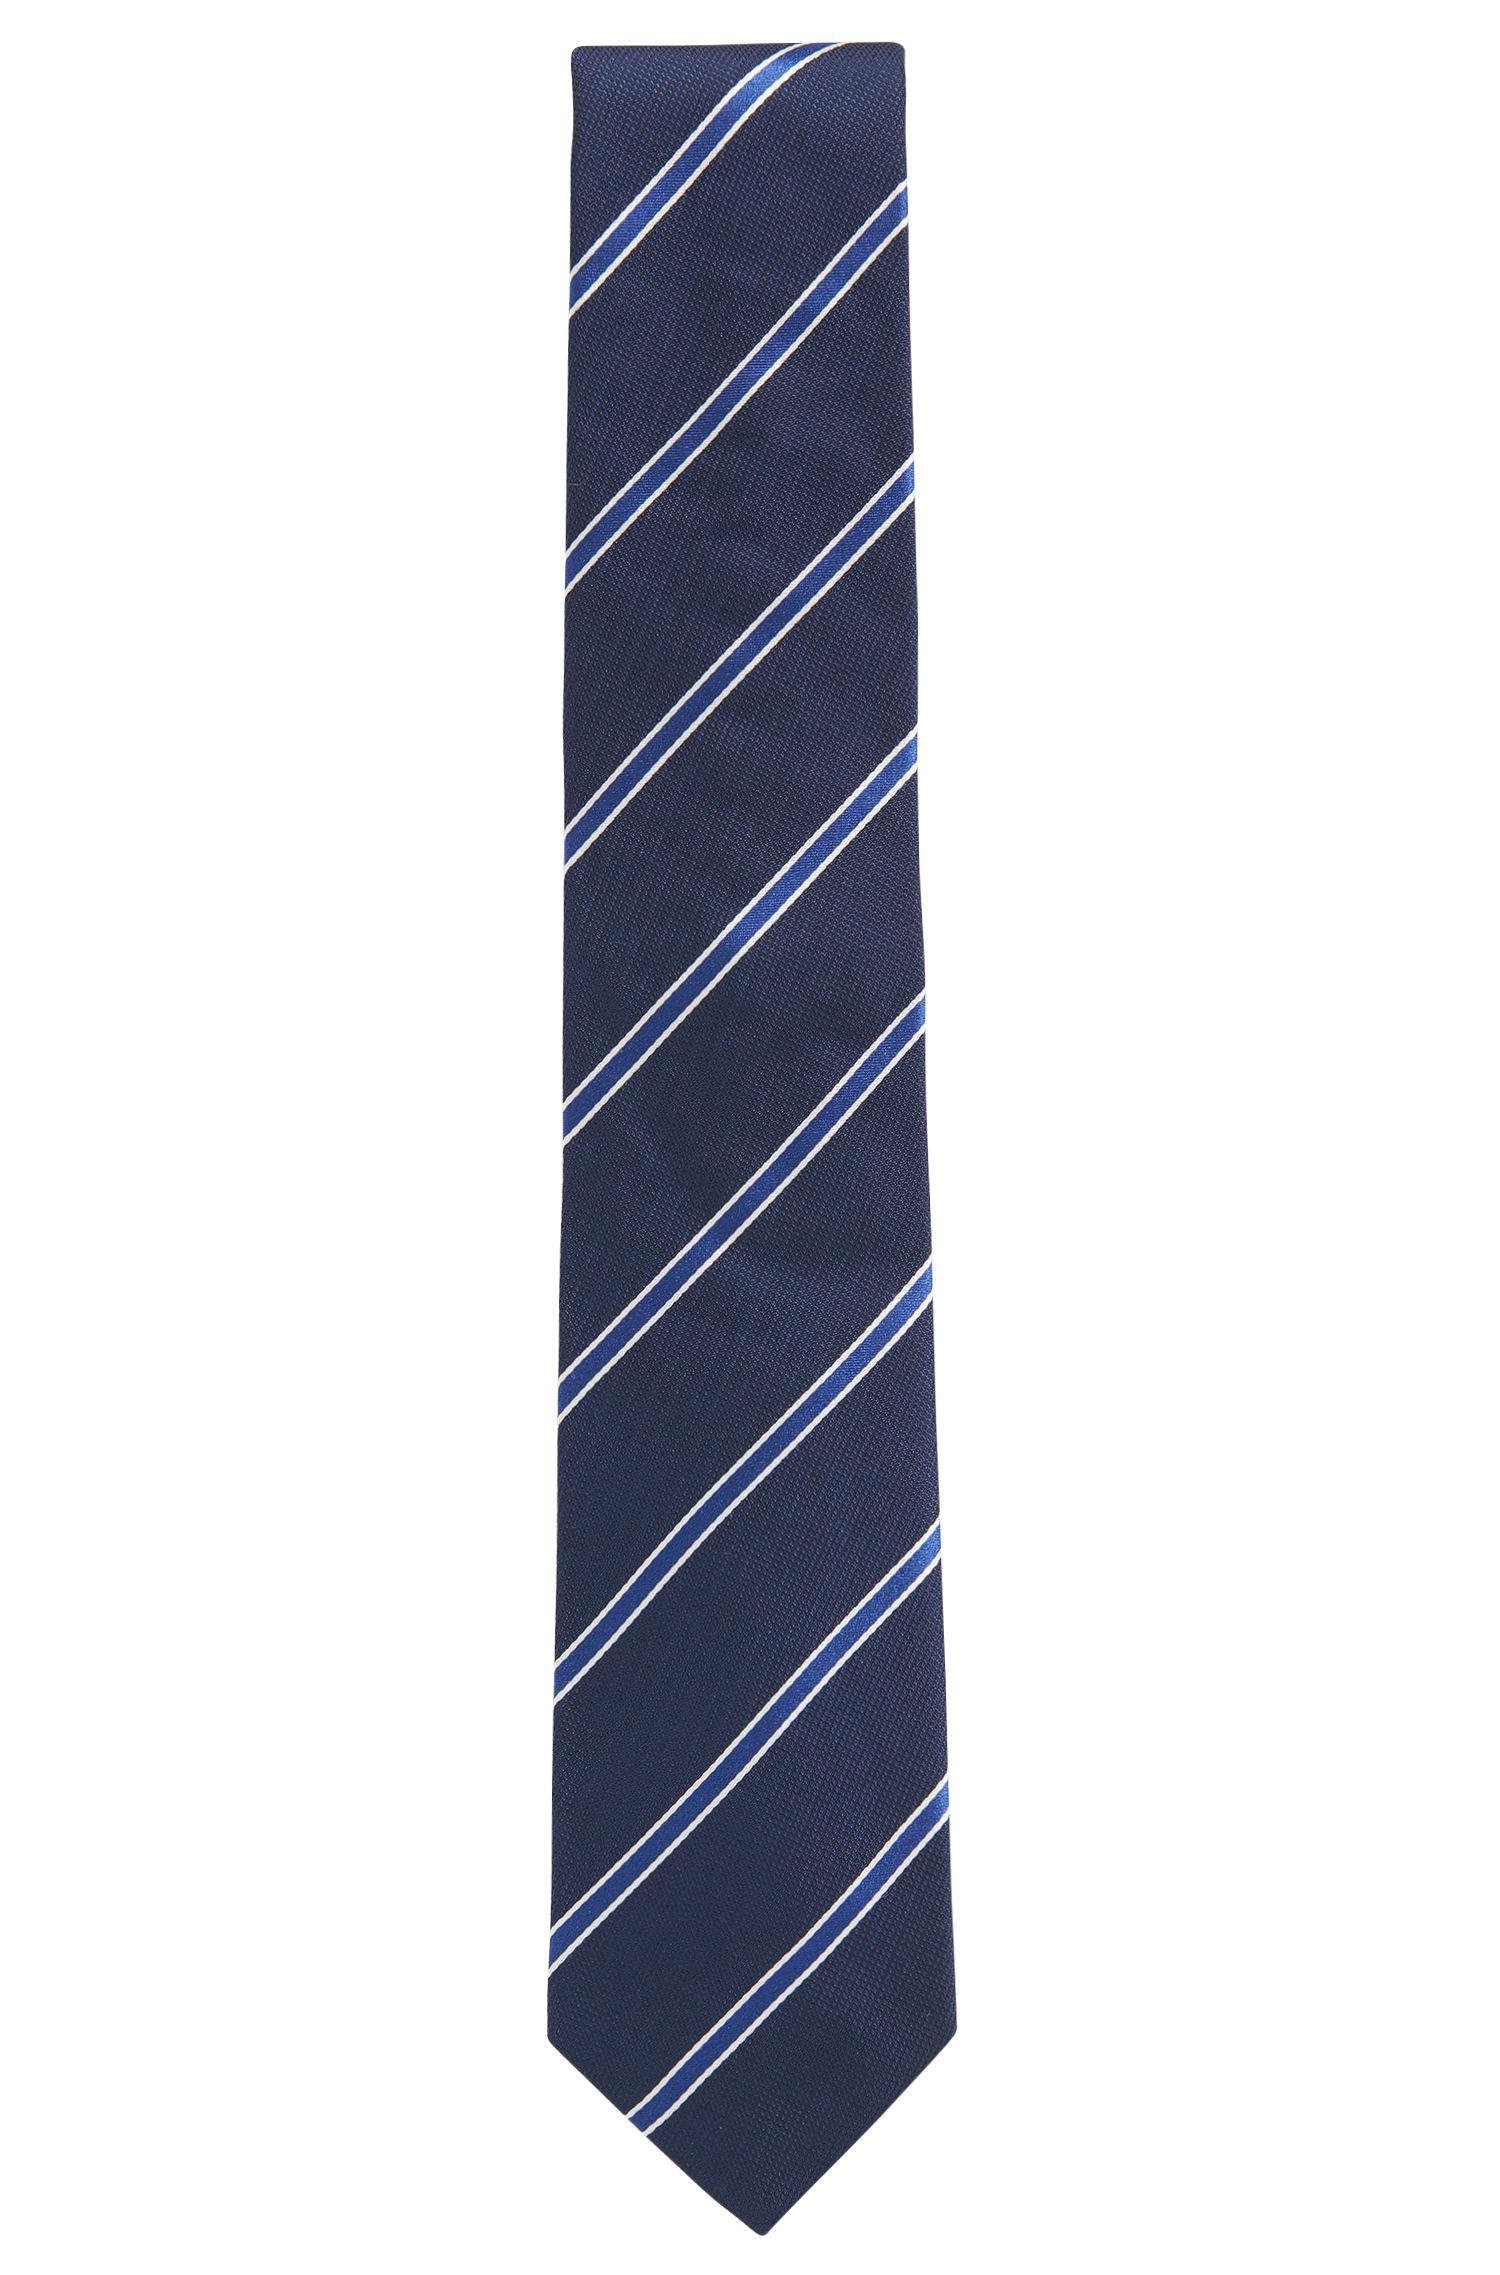 Cheap Lowest Price Diagonal striped tie in silk jacquard BOSS Discount 2018 s3wAVdWyQ3